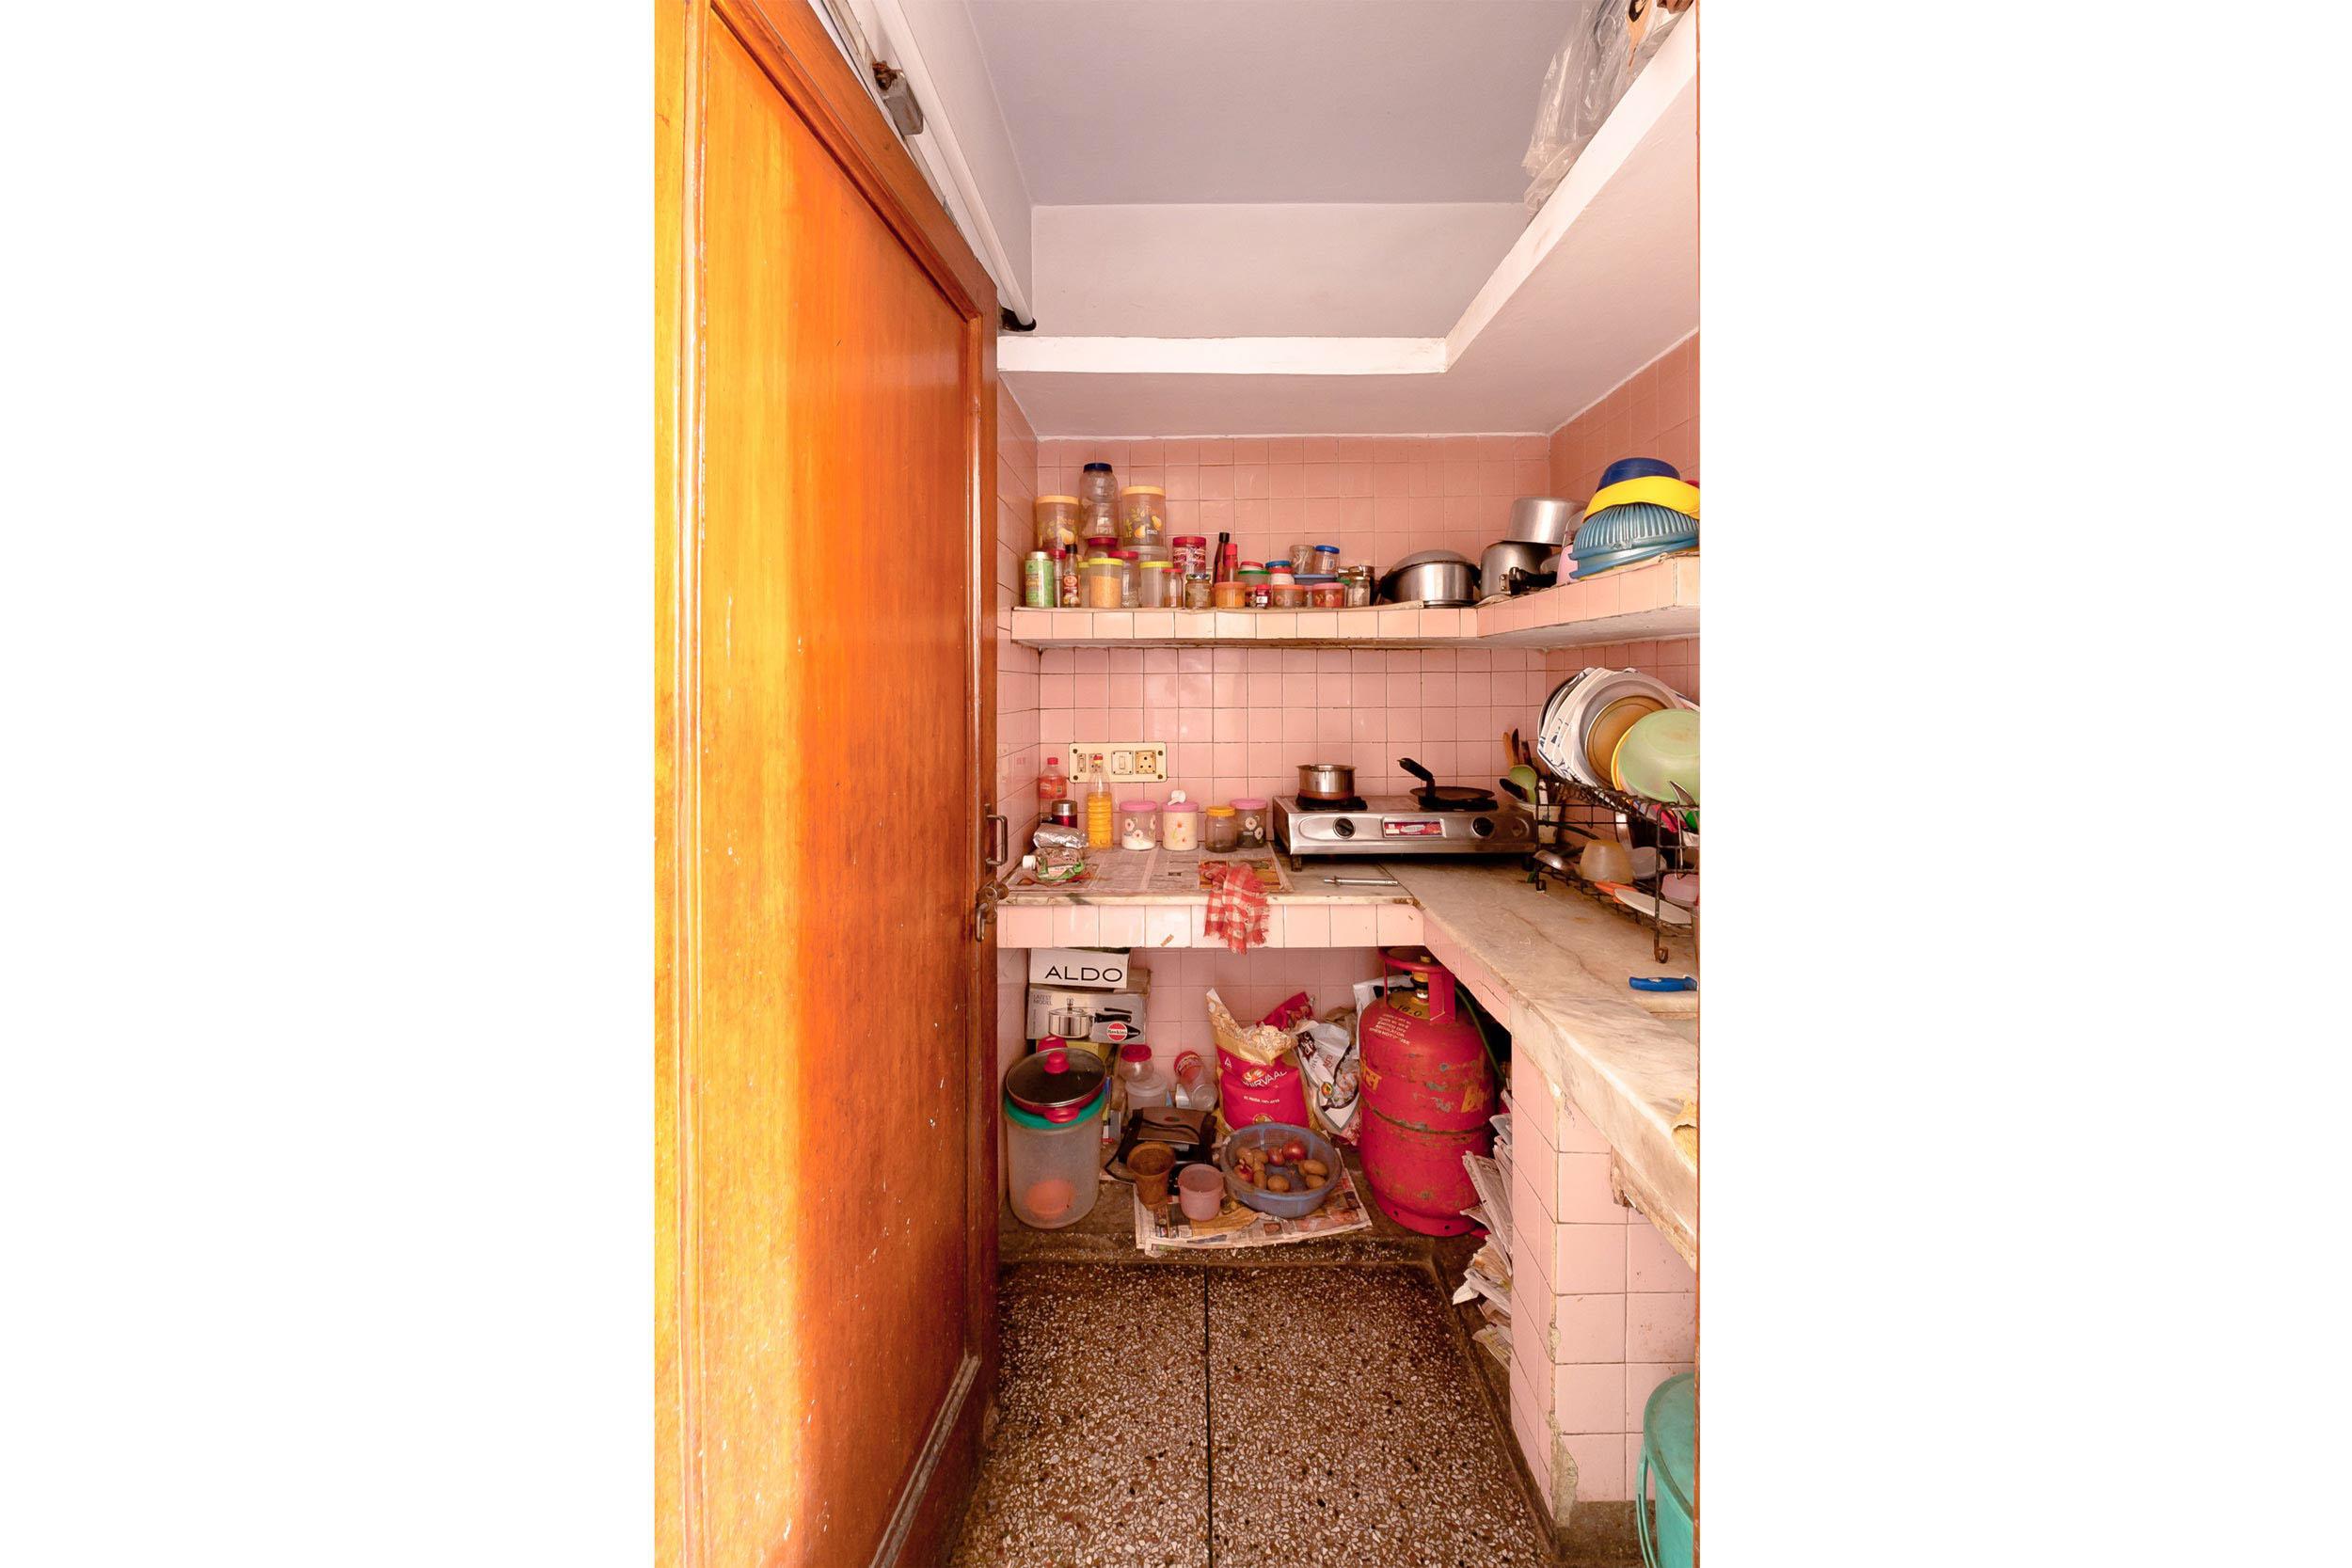 FUW_the-indian-middleclass-kitchen_12-siddharta.jpg